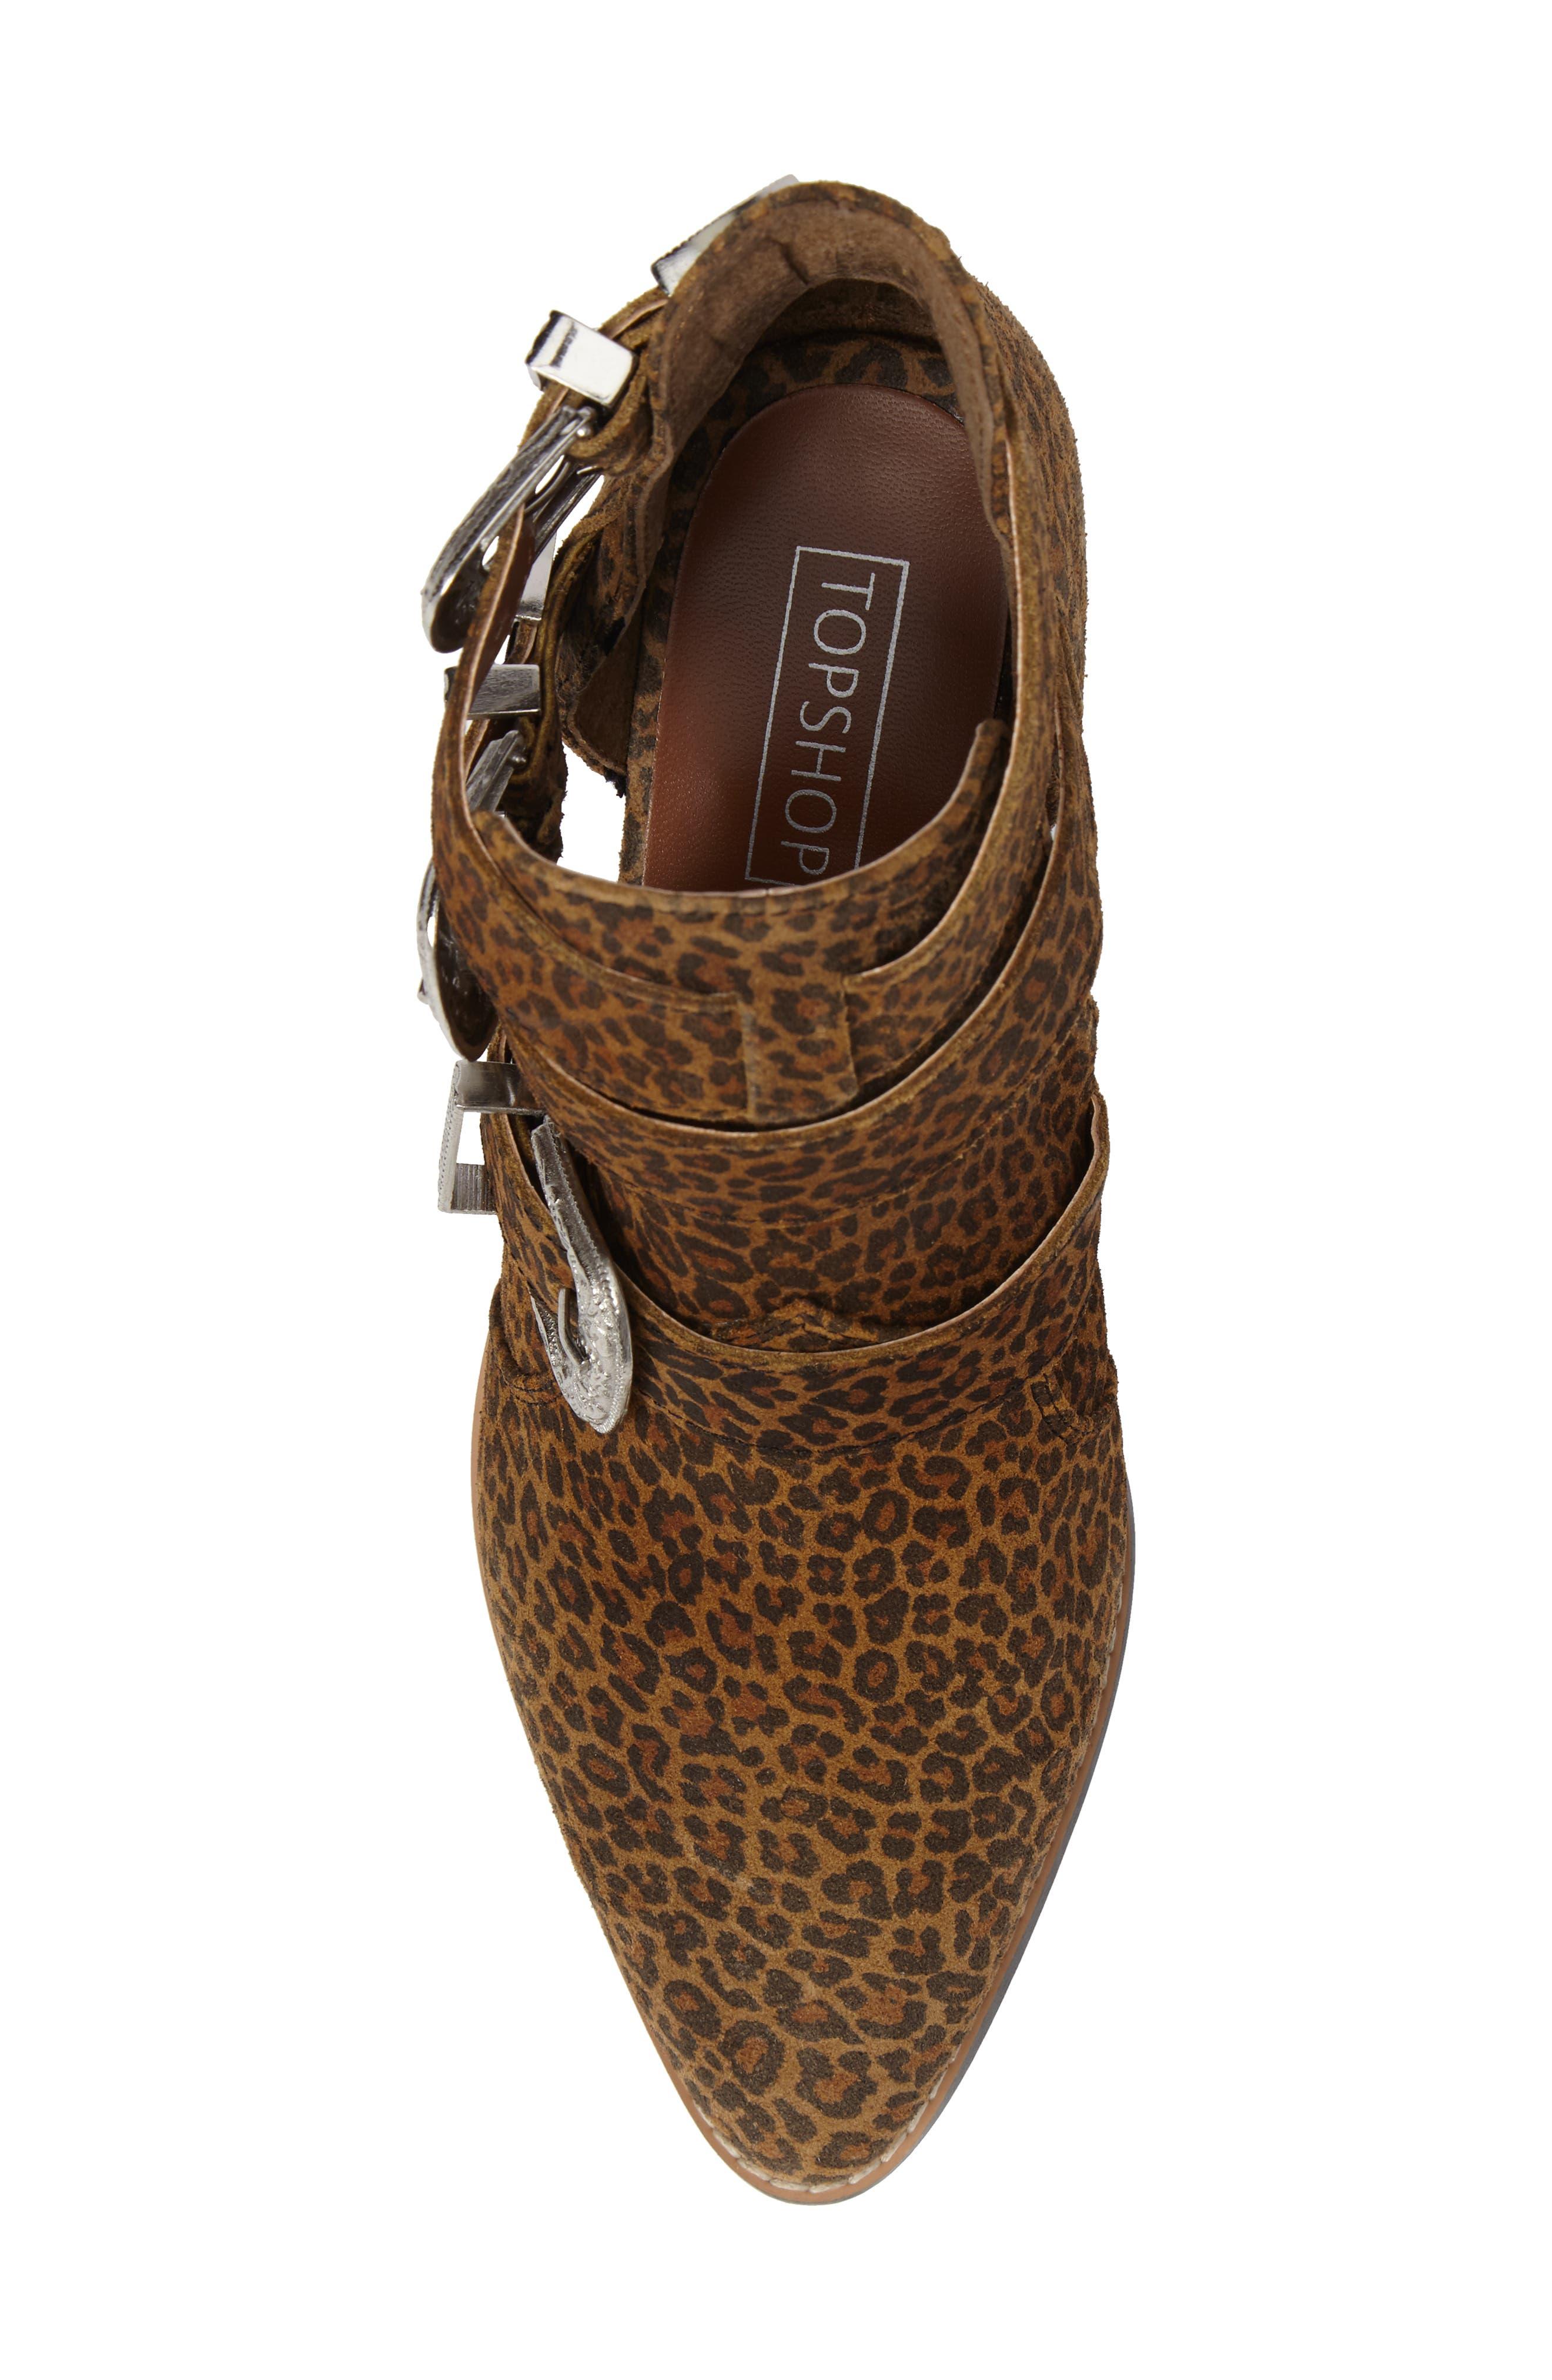 Marmalade Leopard Print Buckle Bootie,                             Alternate thumbnail 5, color,                             Leopard